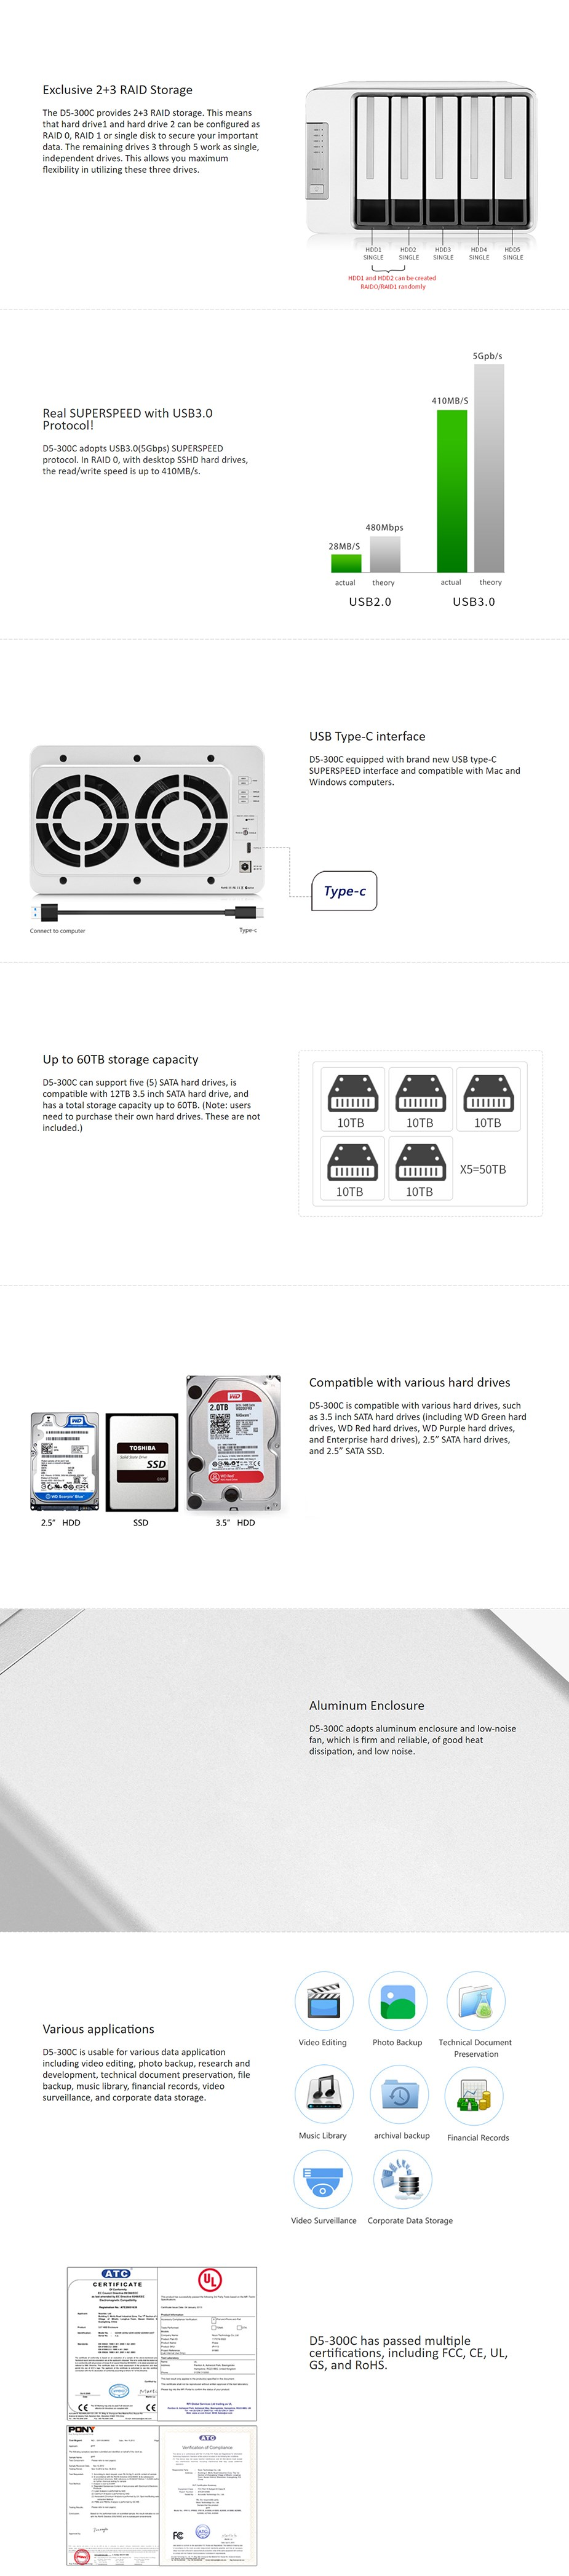 TerraMaster D5-300C 2+3 (5-Bay) USB 3.0 Type-C Raid Storage System - Desktop Overview 1